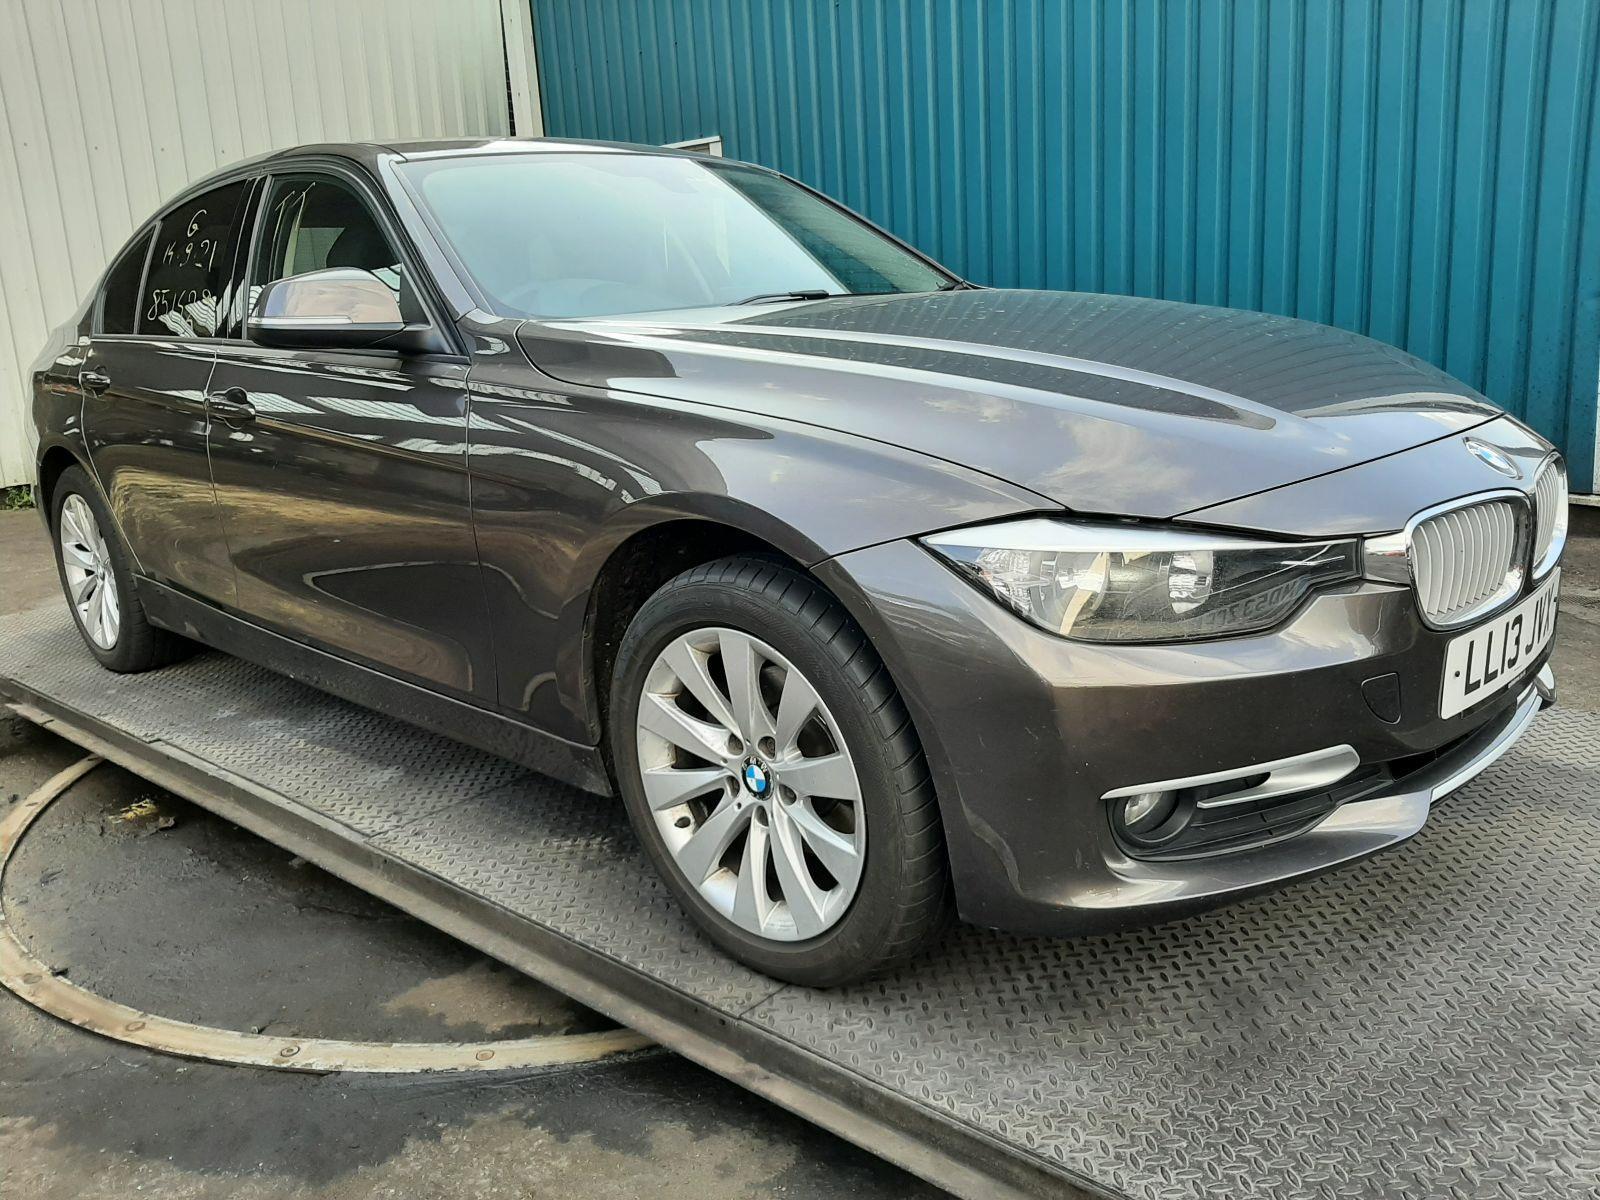 2013 BMW 3 SERIES 318D MODERN 1995cc Turbo Diesel Automatic 4 Door Saloon